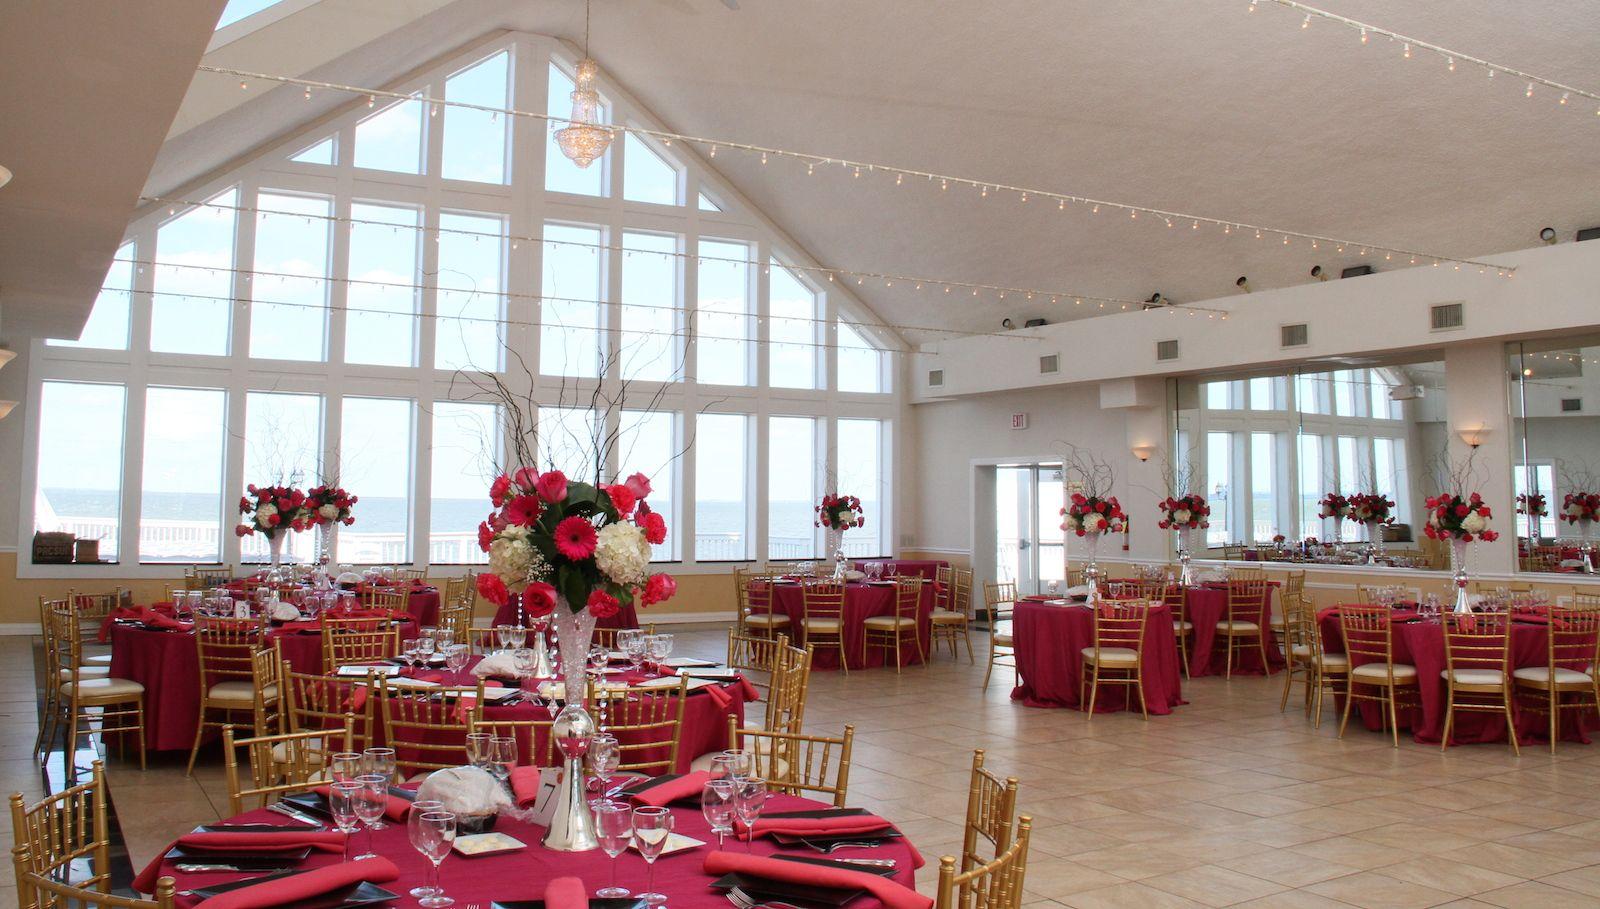 Maryland Waterfront Wedding Venue Waterfront Wedding Venue Maryland Wedding Venues Waterfront Wedding